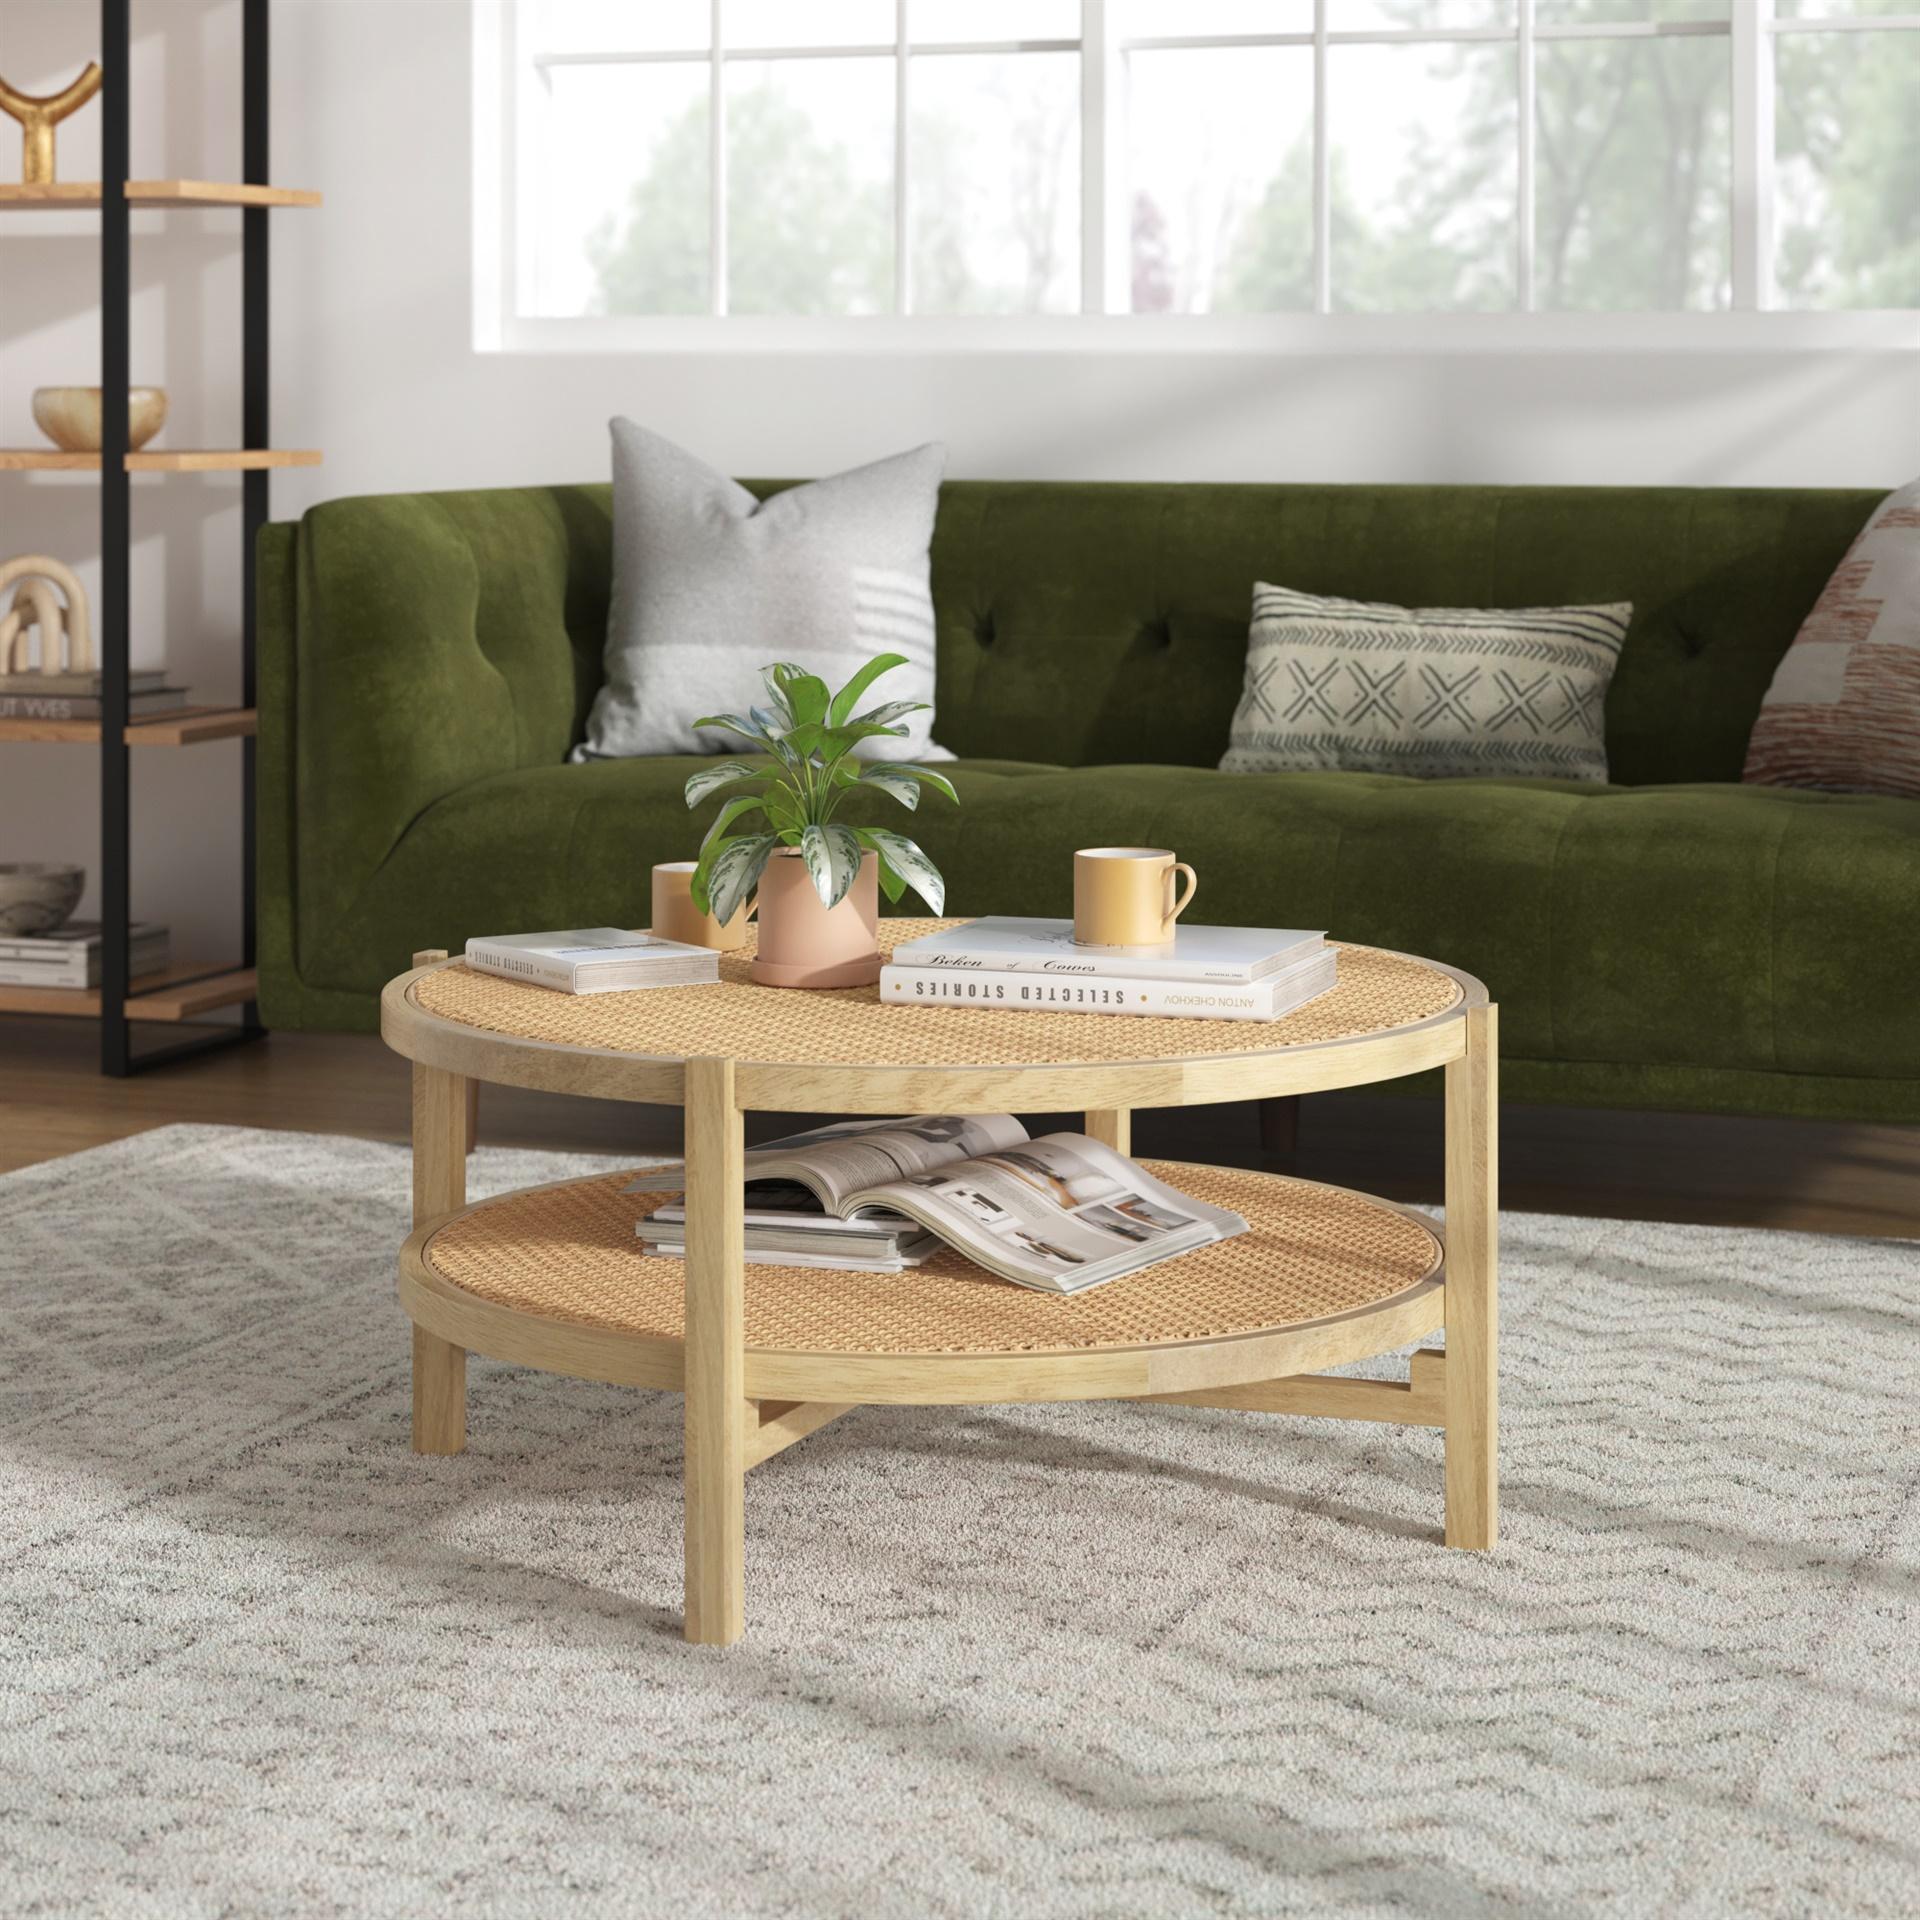 rattan wicker 2 tier coffee table from inmod.com